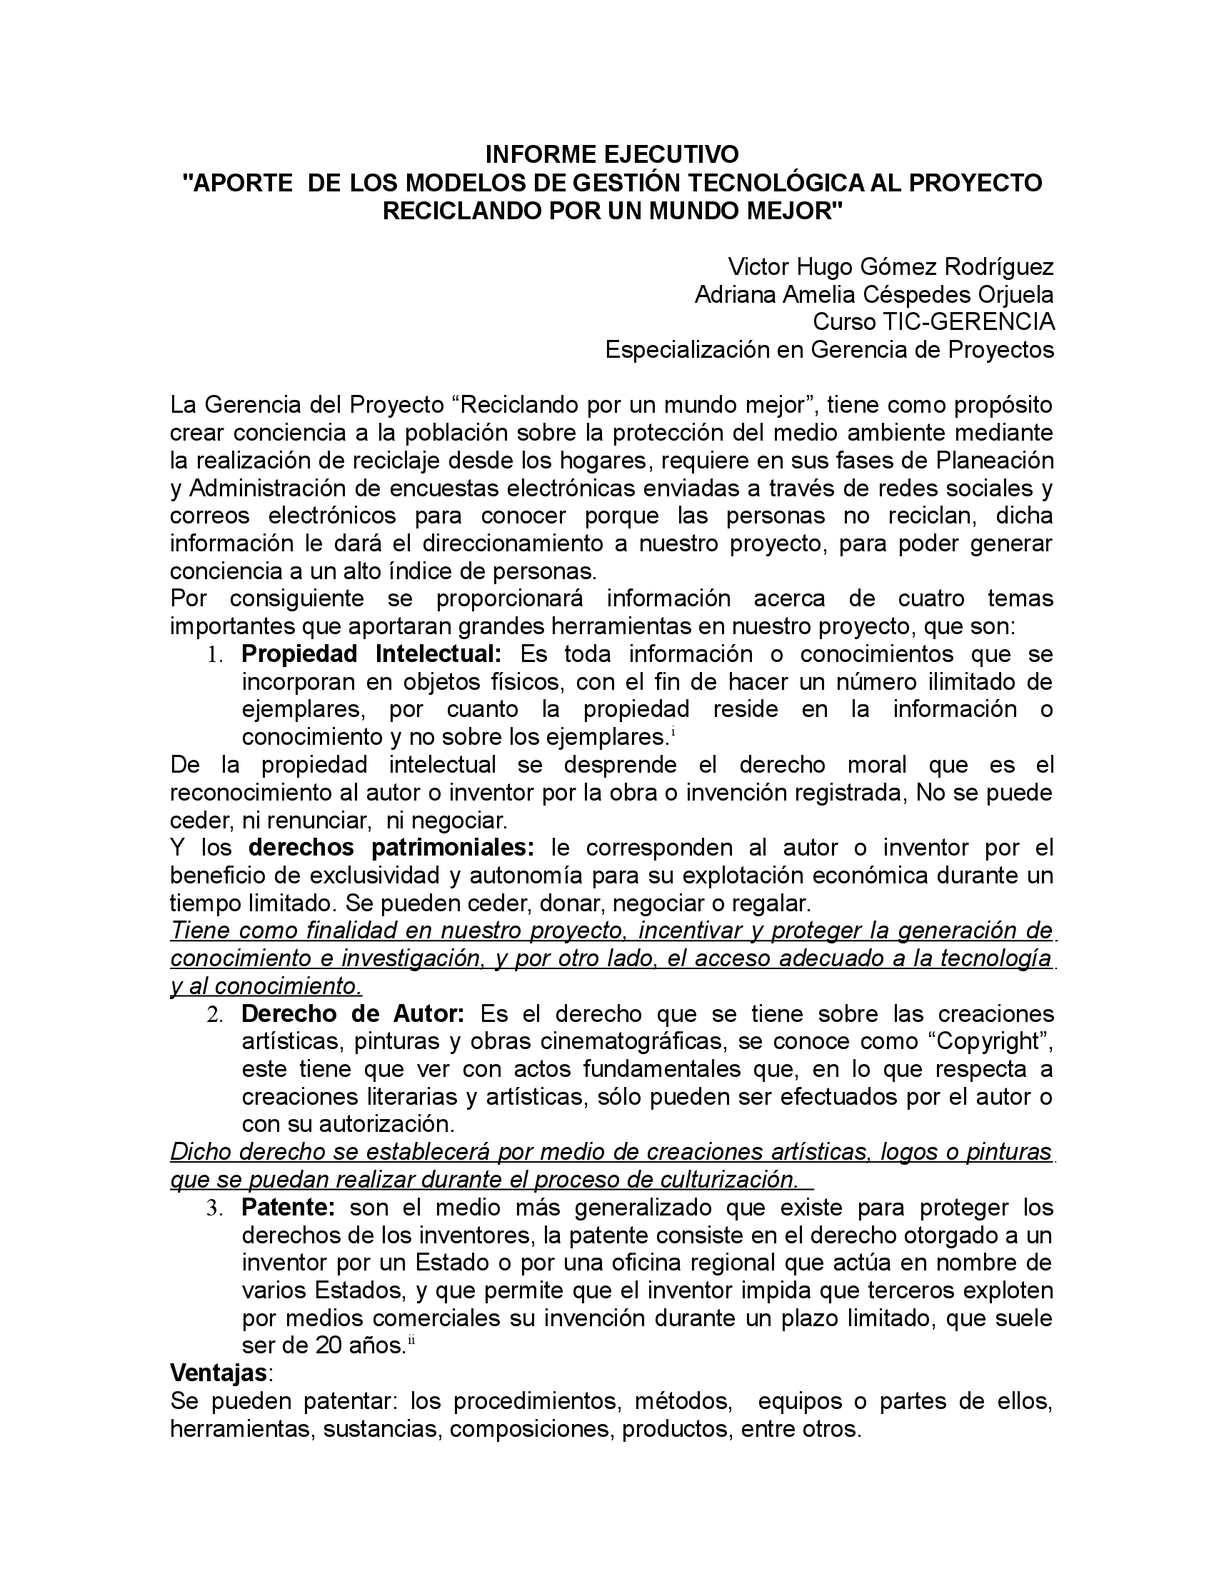 Calaméo Informe Ejecutivo Modelos De Gestión Tecnológicadocx